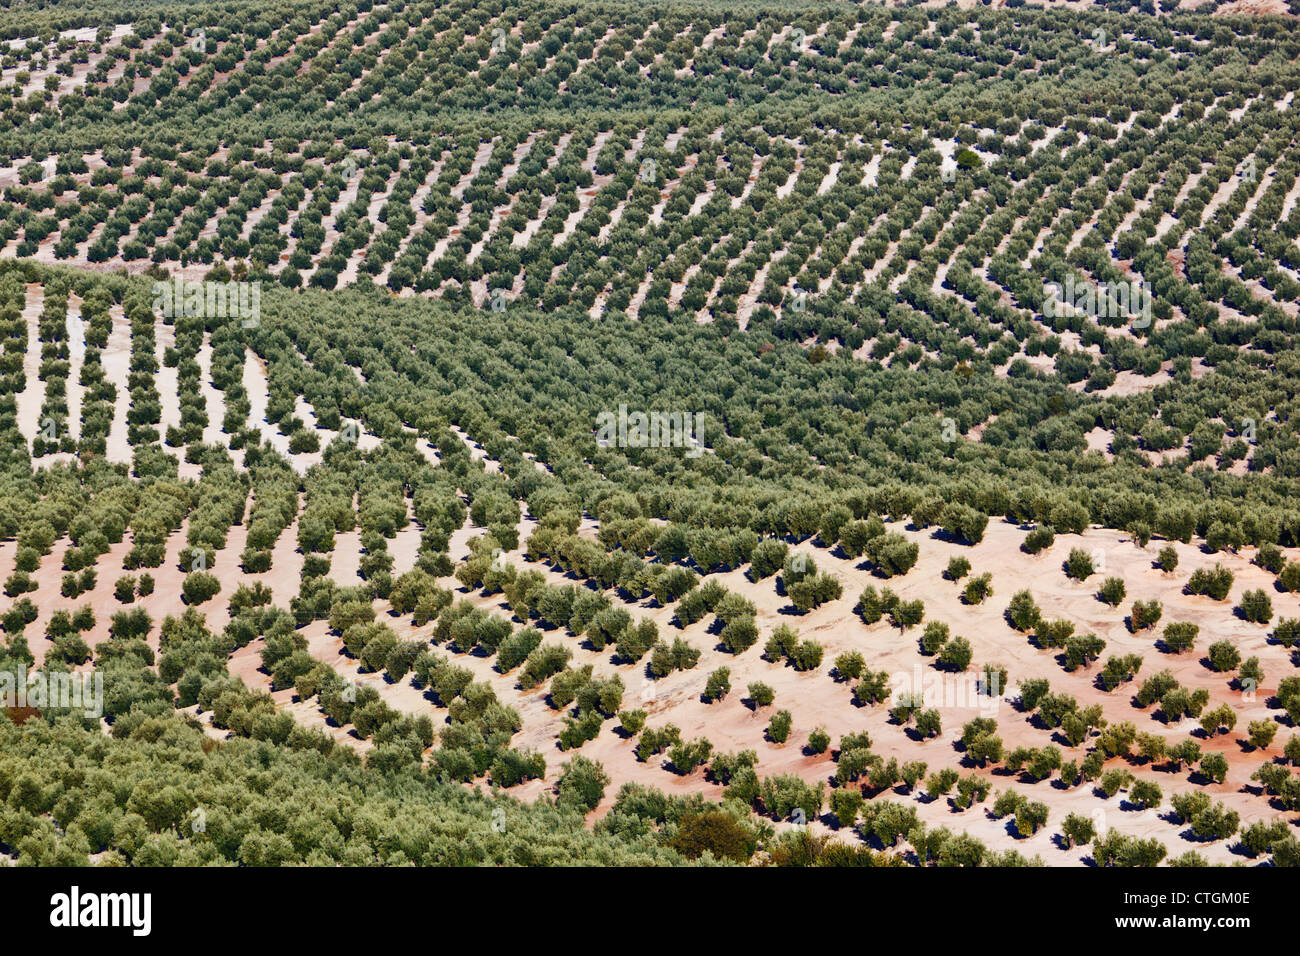 Olive Groves Near Mancha Real; Jaen Province, Spain Stock Photo